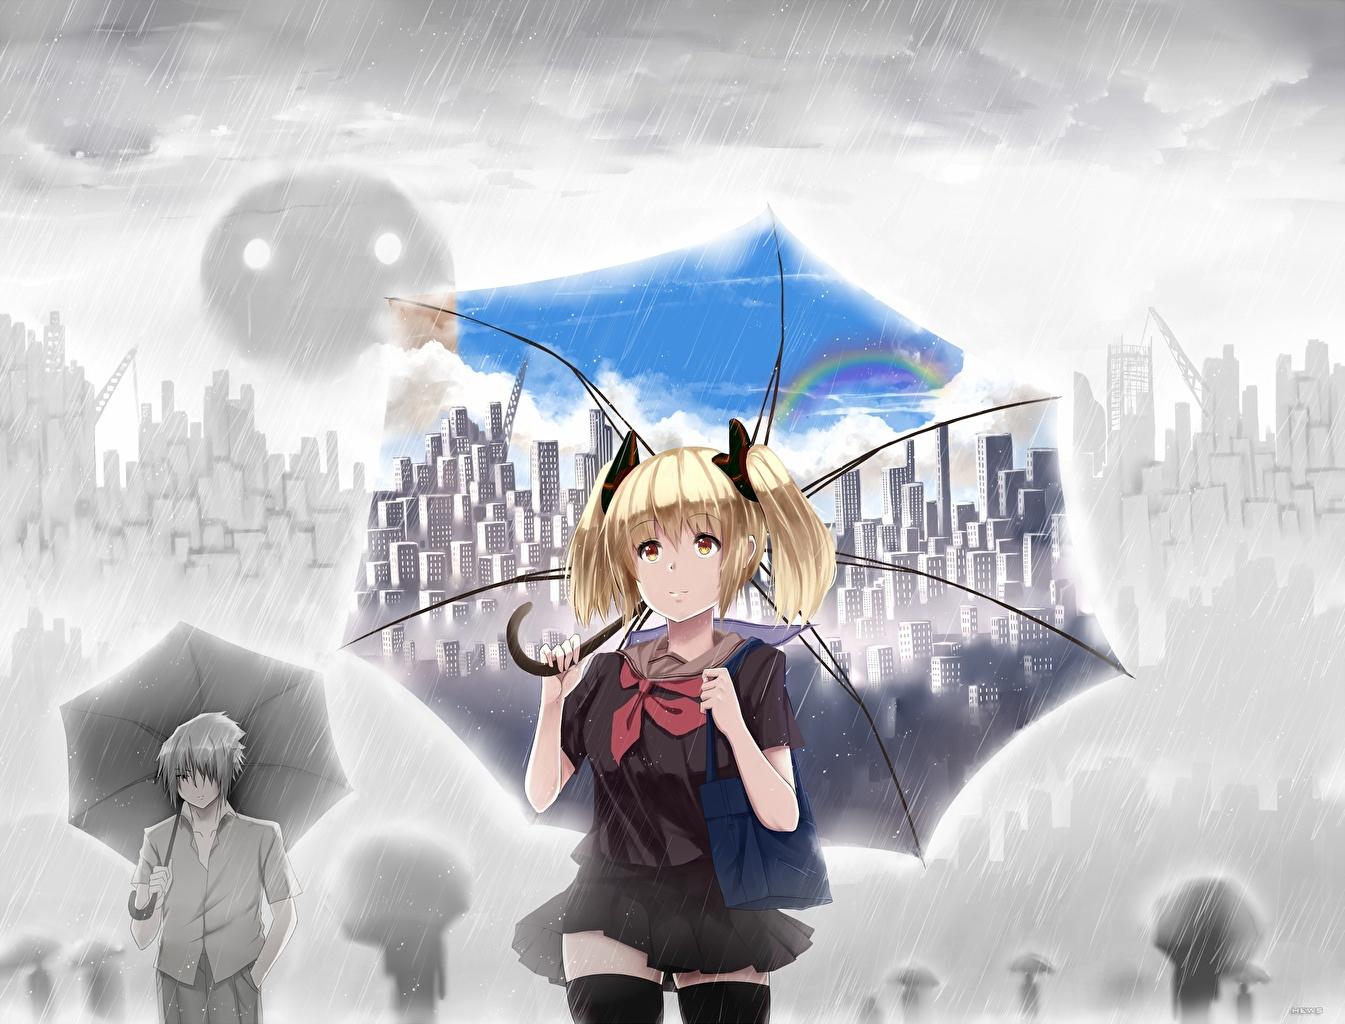 Photo Schoolgirl Blonde girl hewsack Anime Girls Rain Umbrella Schoolgirls female young woman parasol